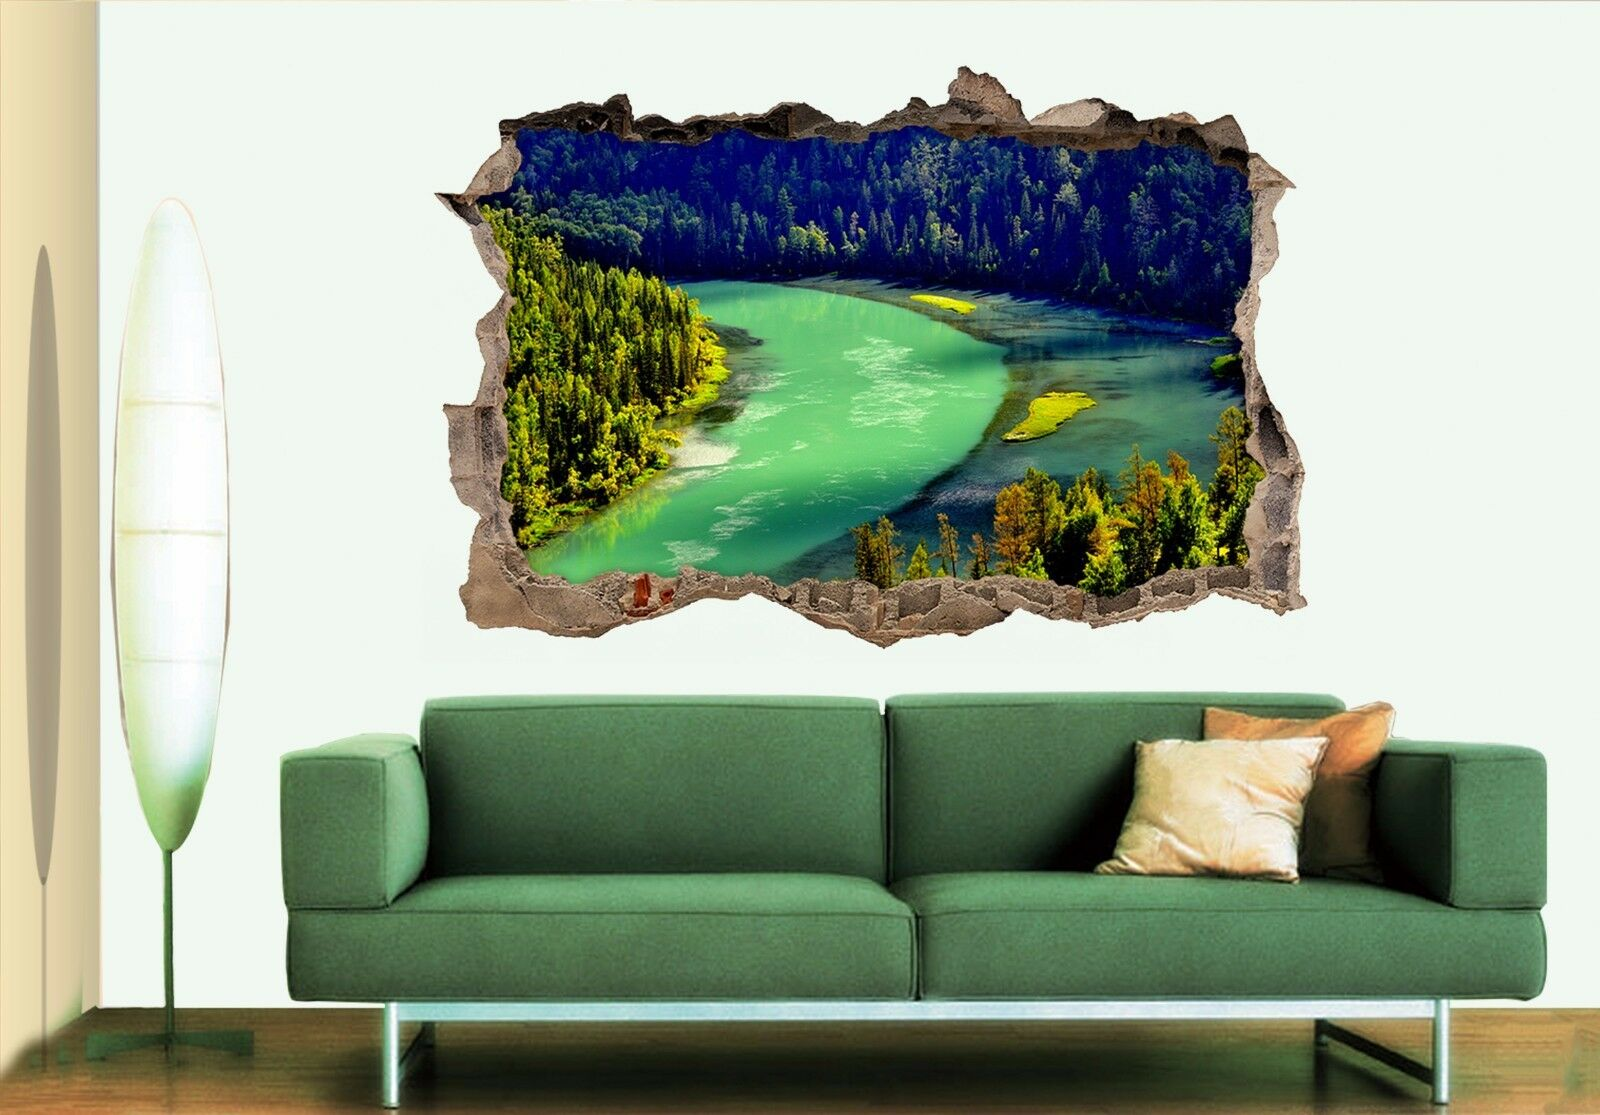 3D 3D 3D Bellissimo Lago 176 Parete Murales Adesivi Decal Sfondamento AJ WALLPAPER IT 6a2884